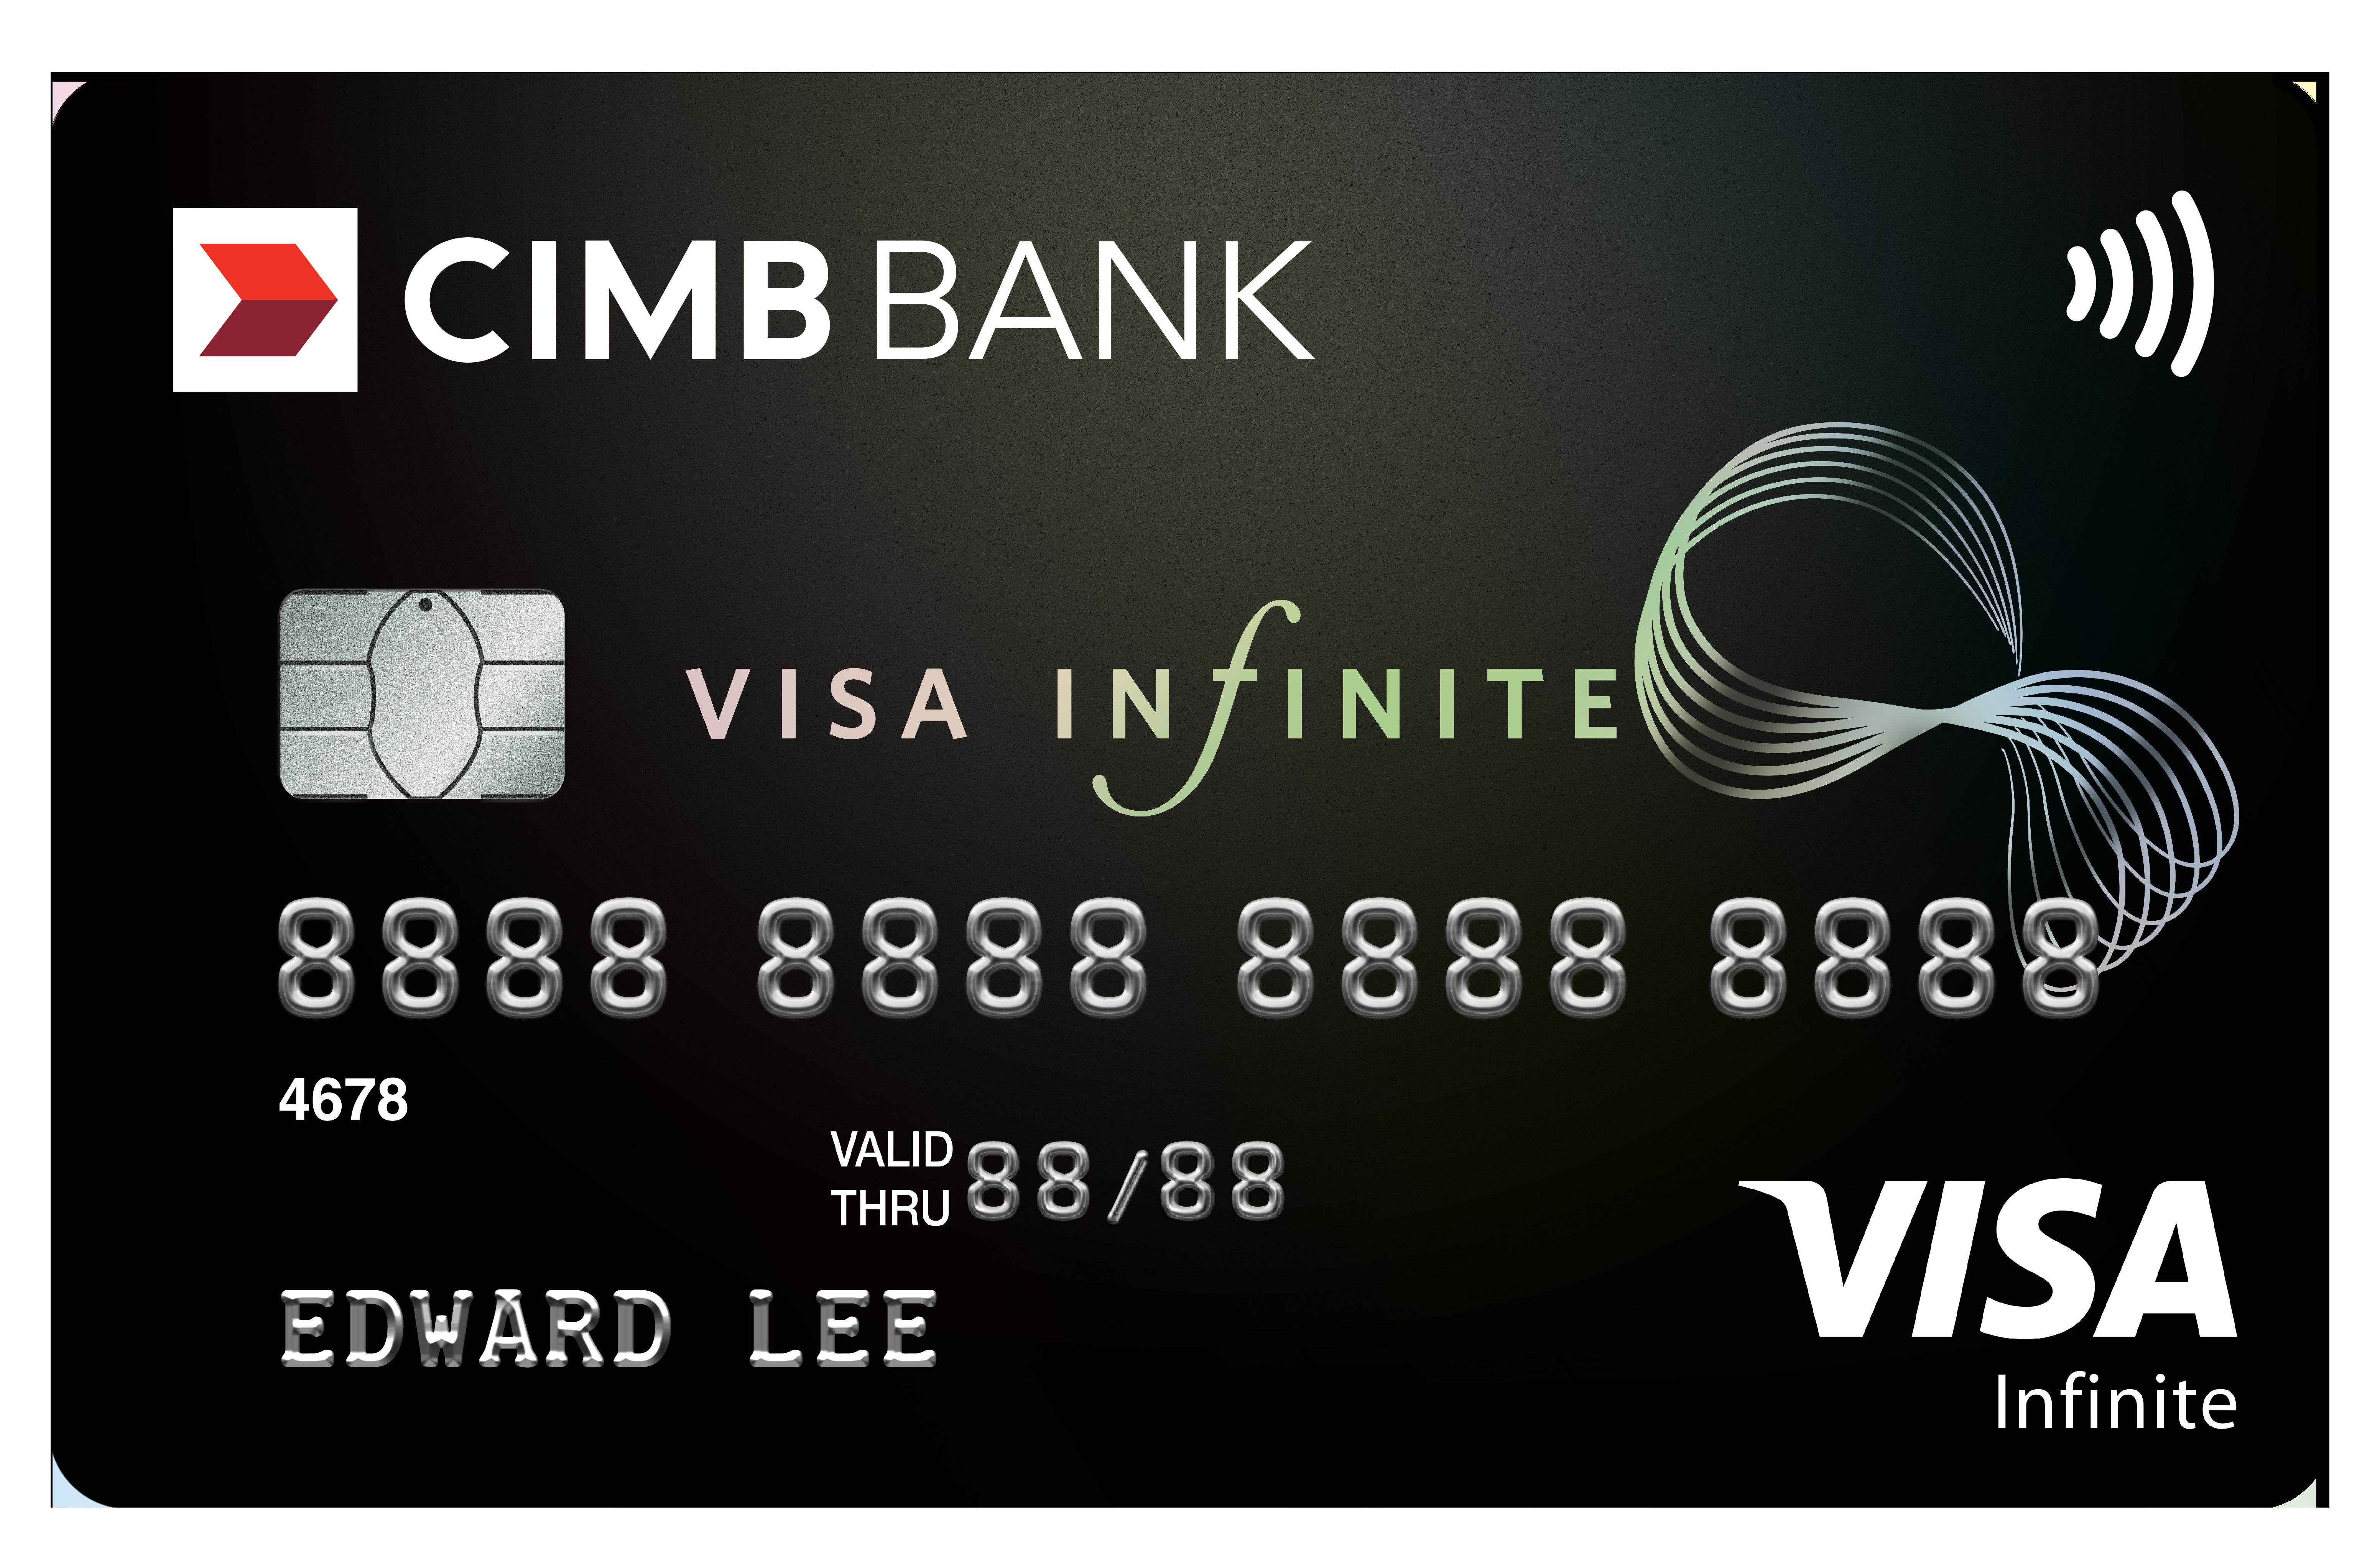 CIMB Visa Infinite Promos